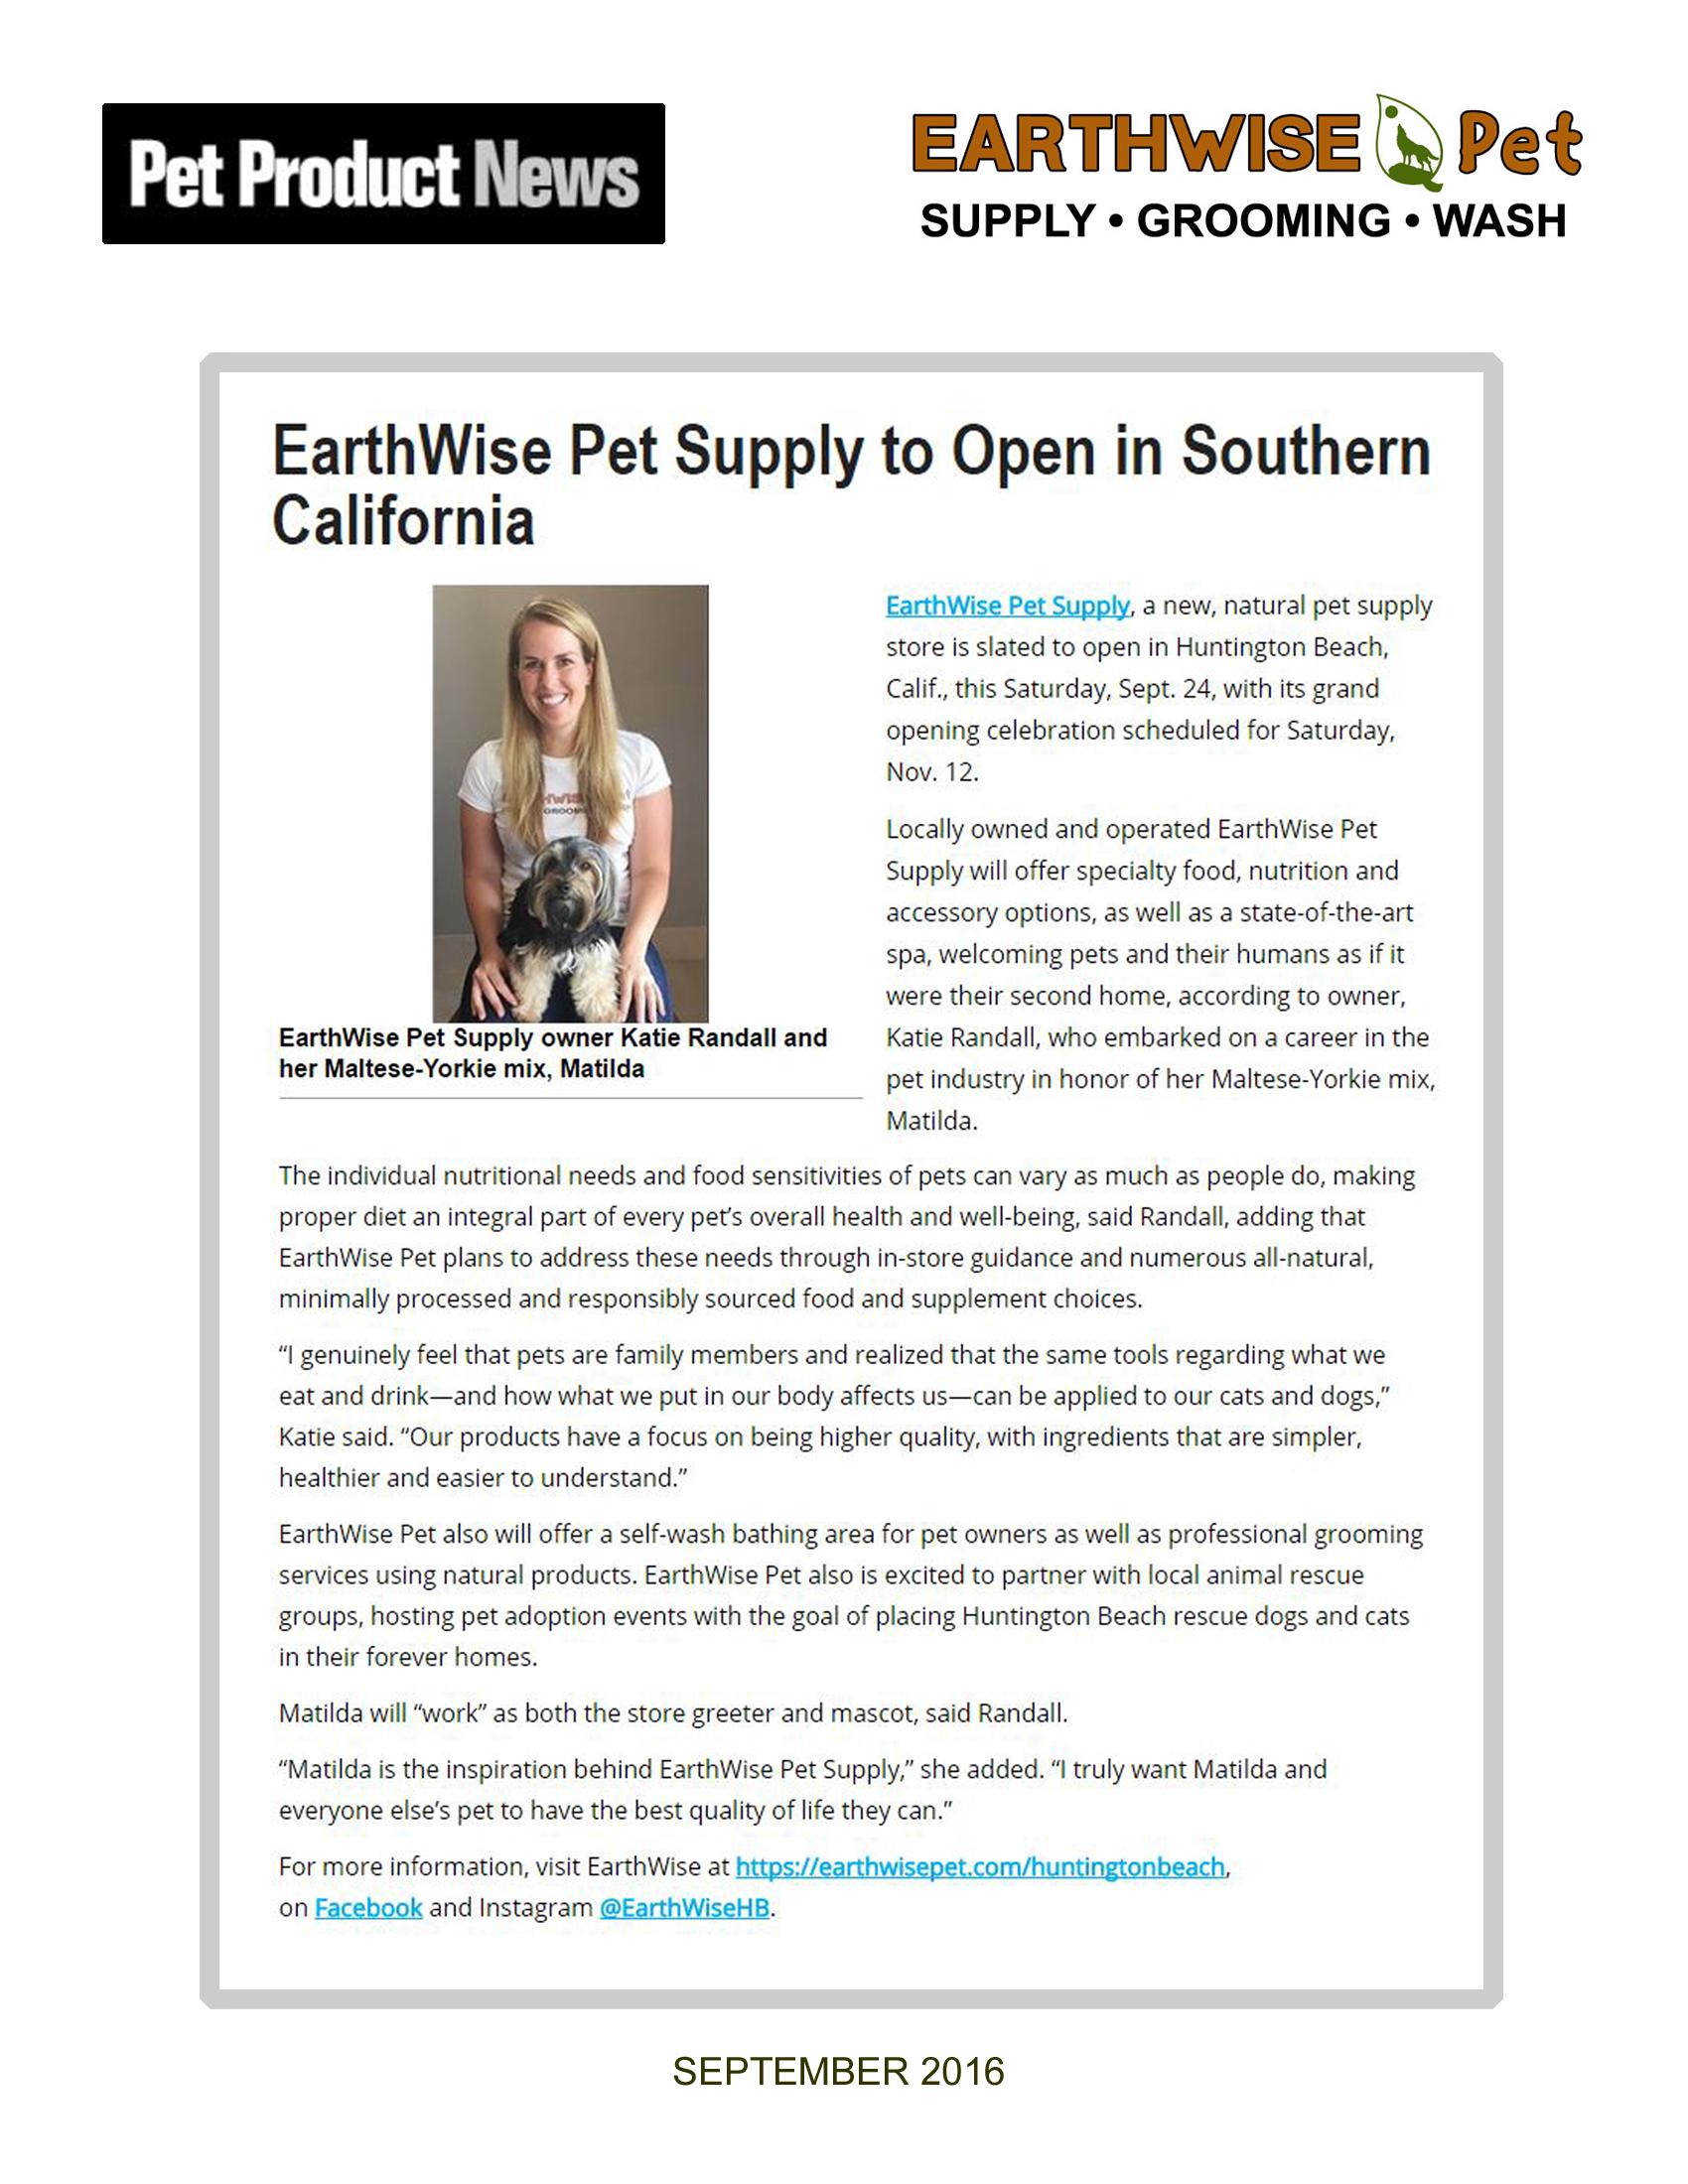 PetProductNews_Sept2016.jpg